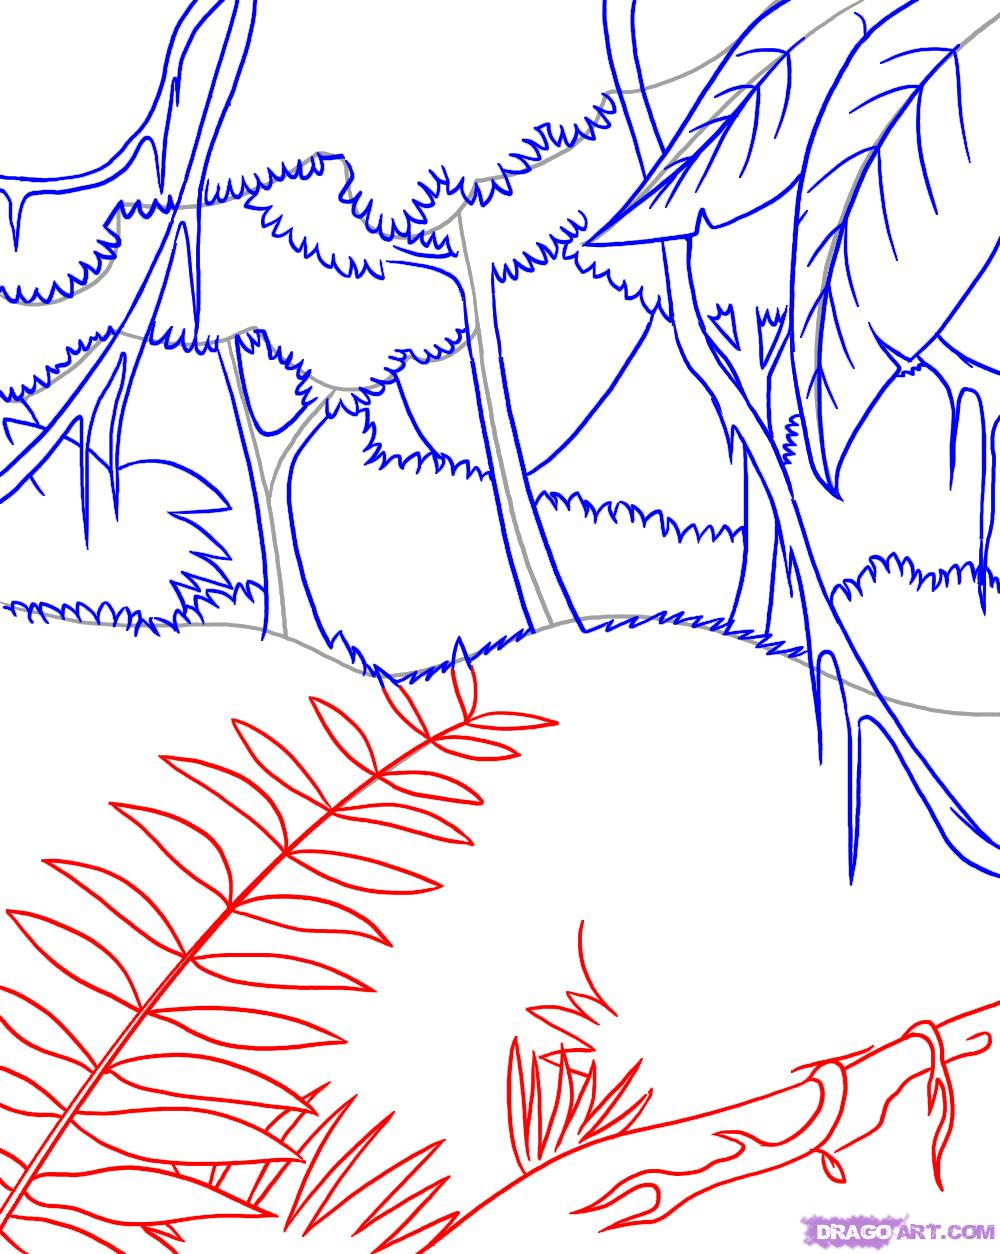 Drawn rainforest To  Draw a Rainforest